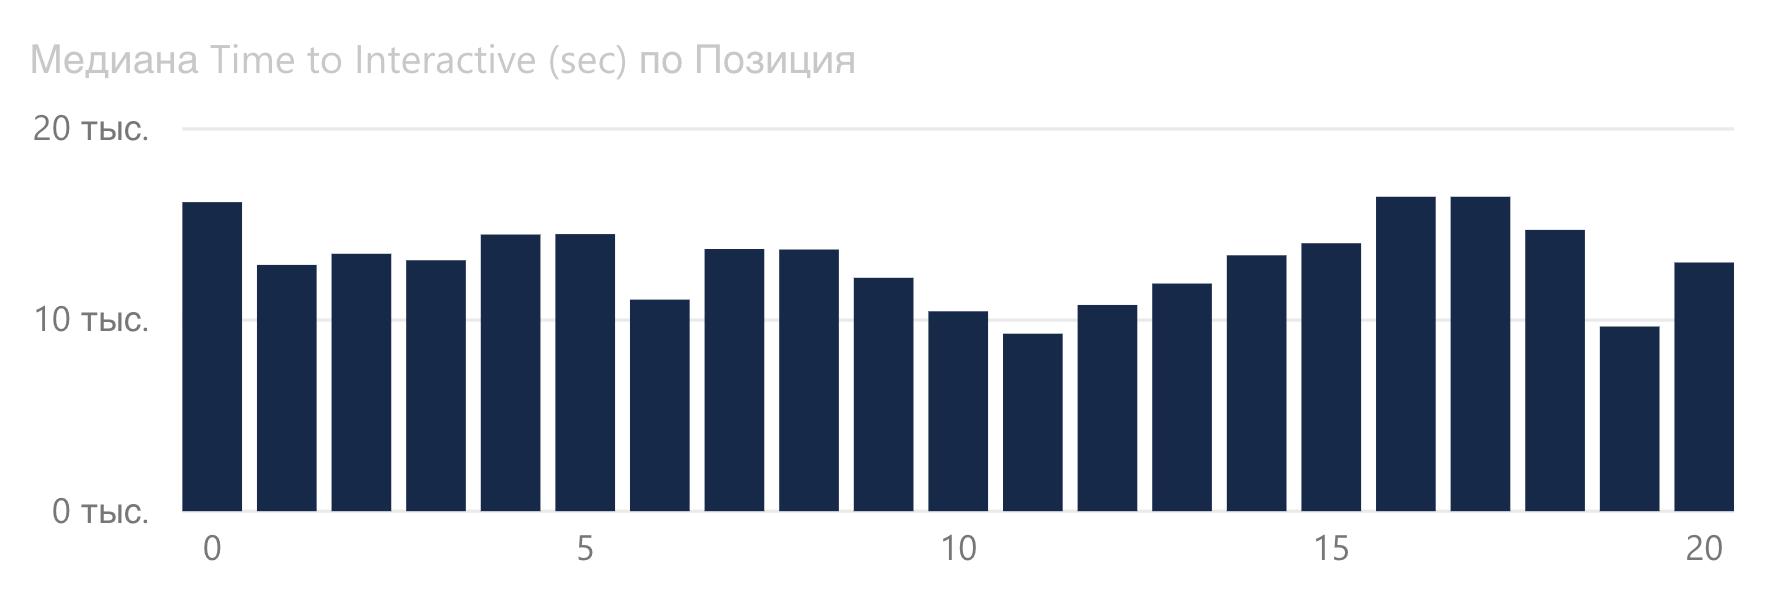 График зависимости Time to Interactive от позиции Google в сфере fashion.